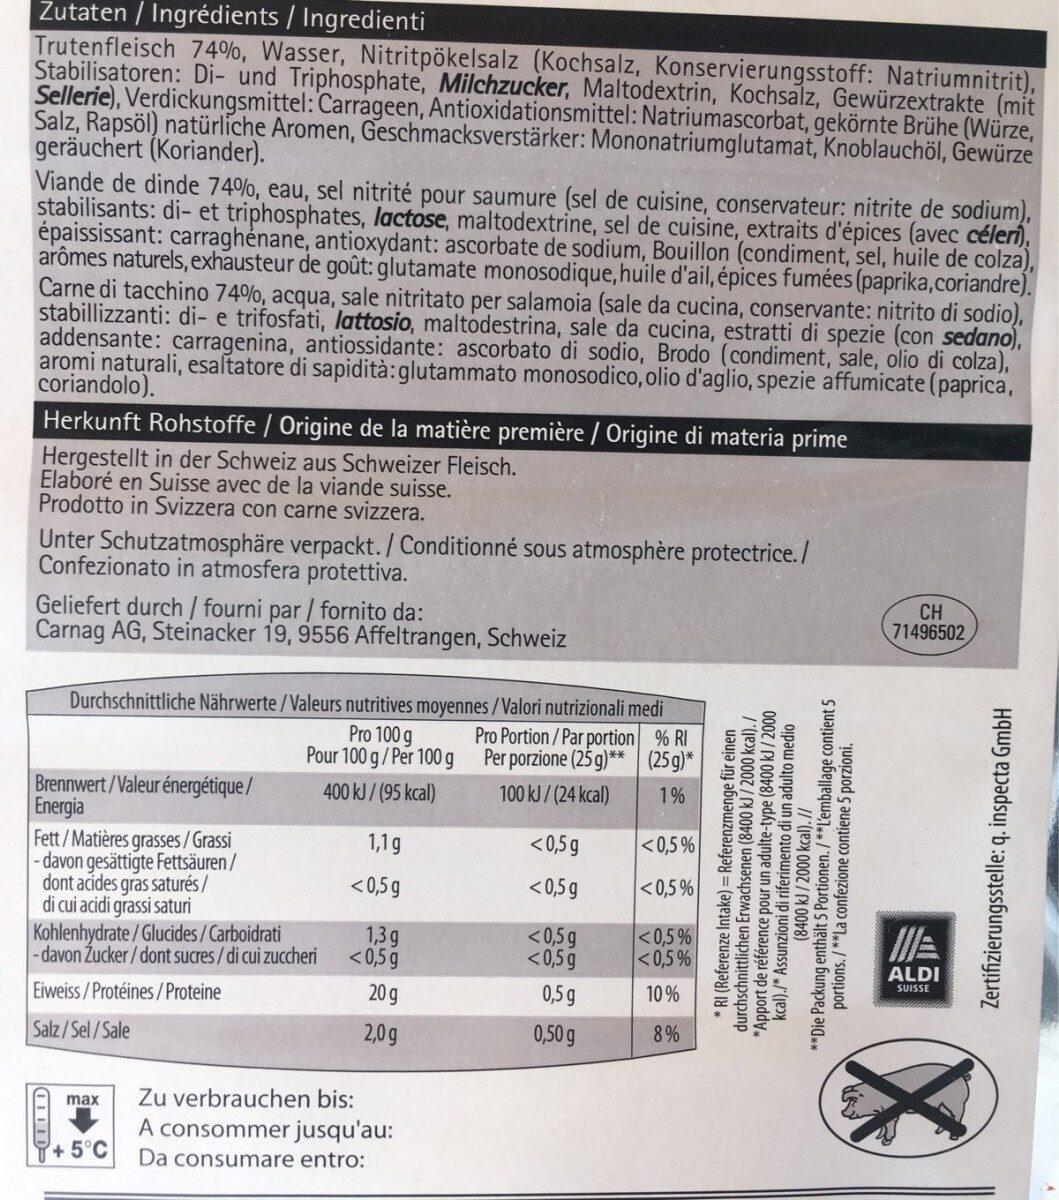 Schinken Barbecue - Informations nutritionnelles - fr